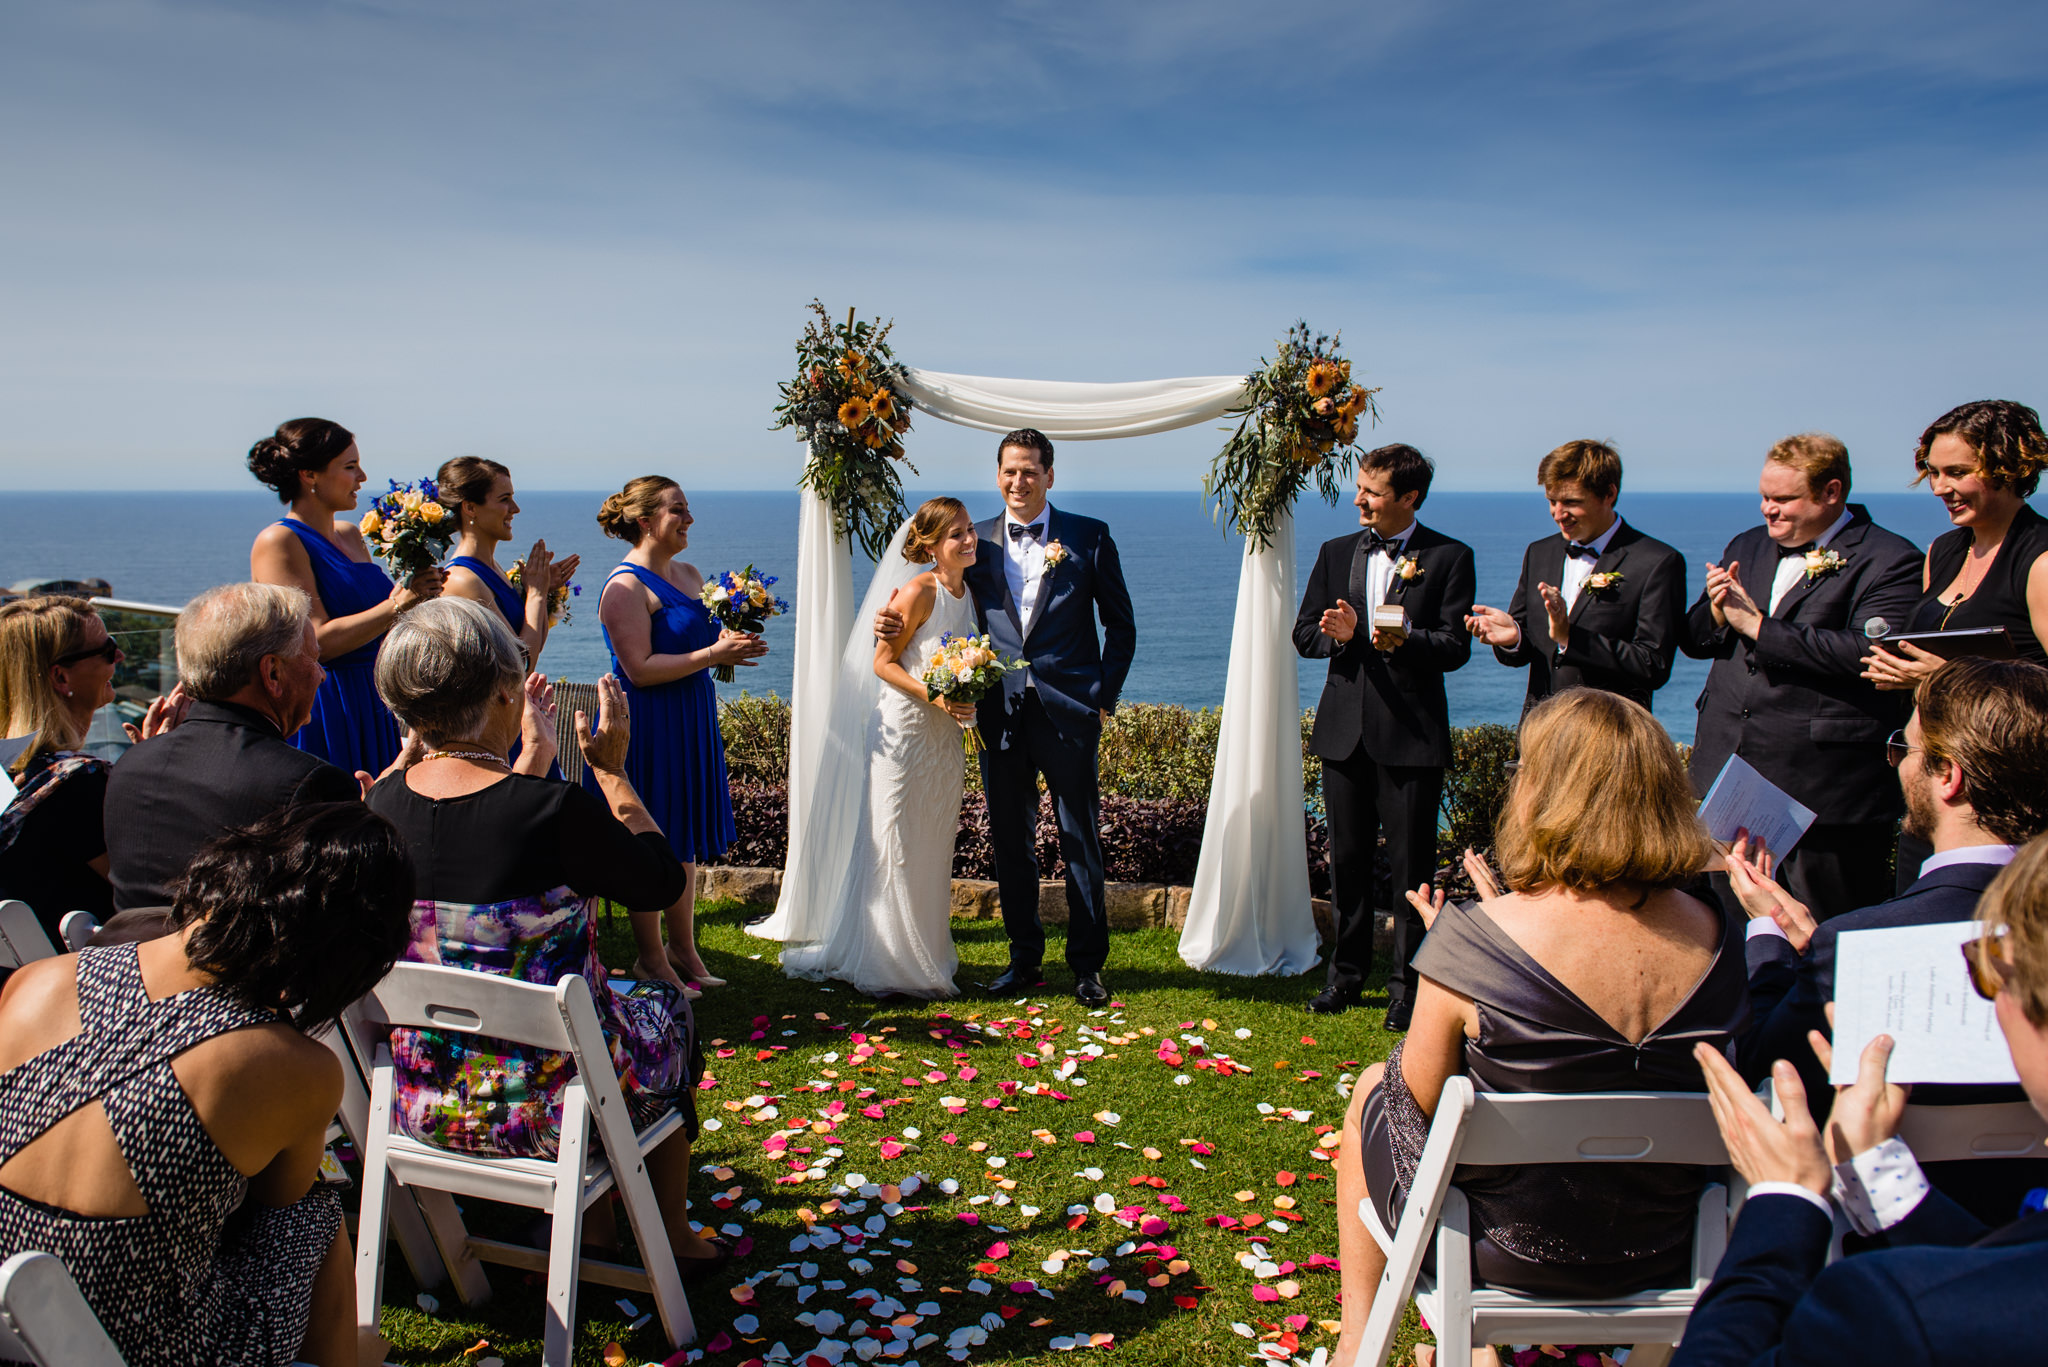 Jonahs-Whale-Beach-wedding-0005.jpg